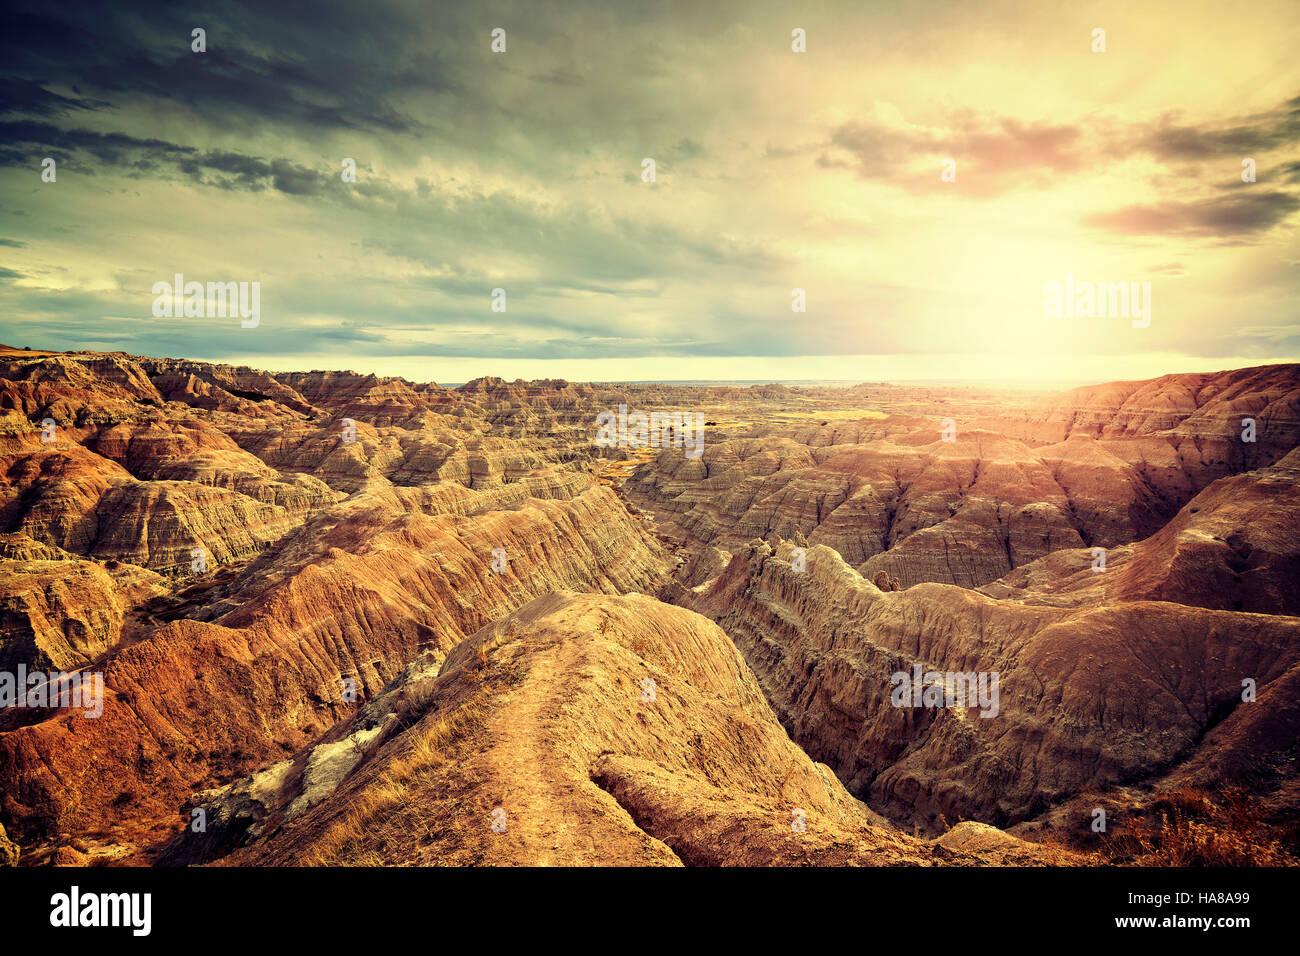 Vintage toned scenic sunset over Badlands National Park, South Dakota, USA. - Stock Image